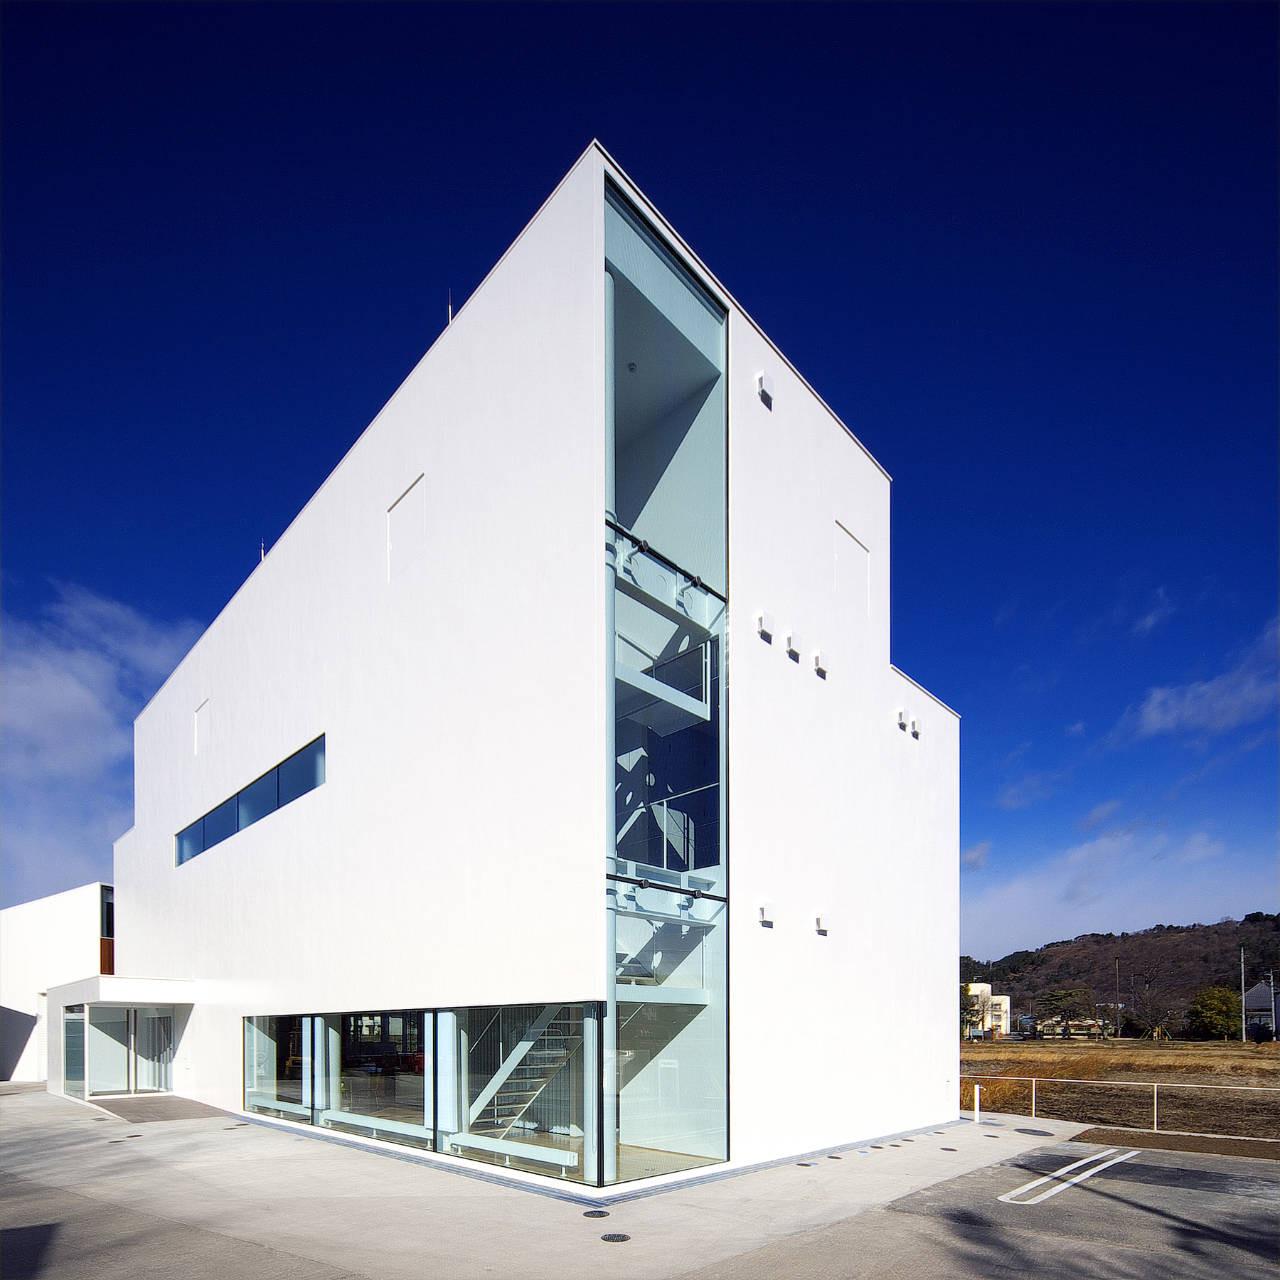 GaW / Satoru Hirota Architects, © Satoru Hirota